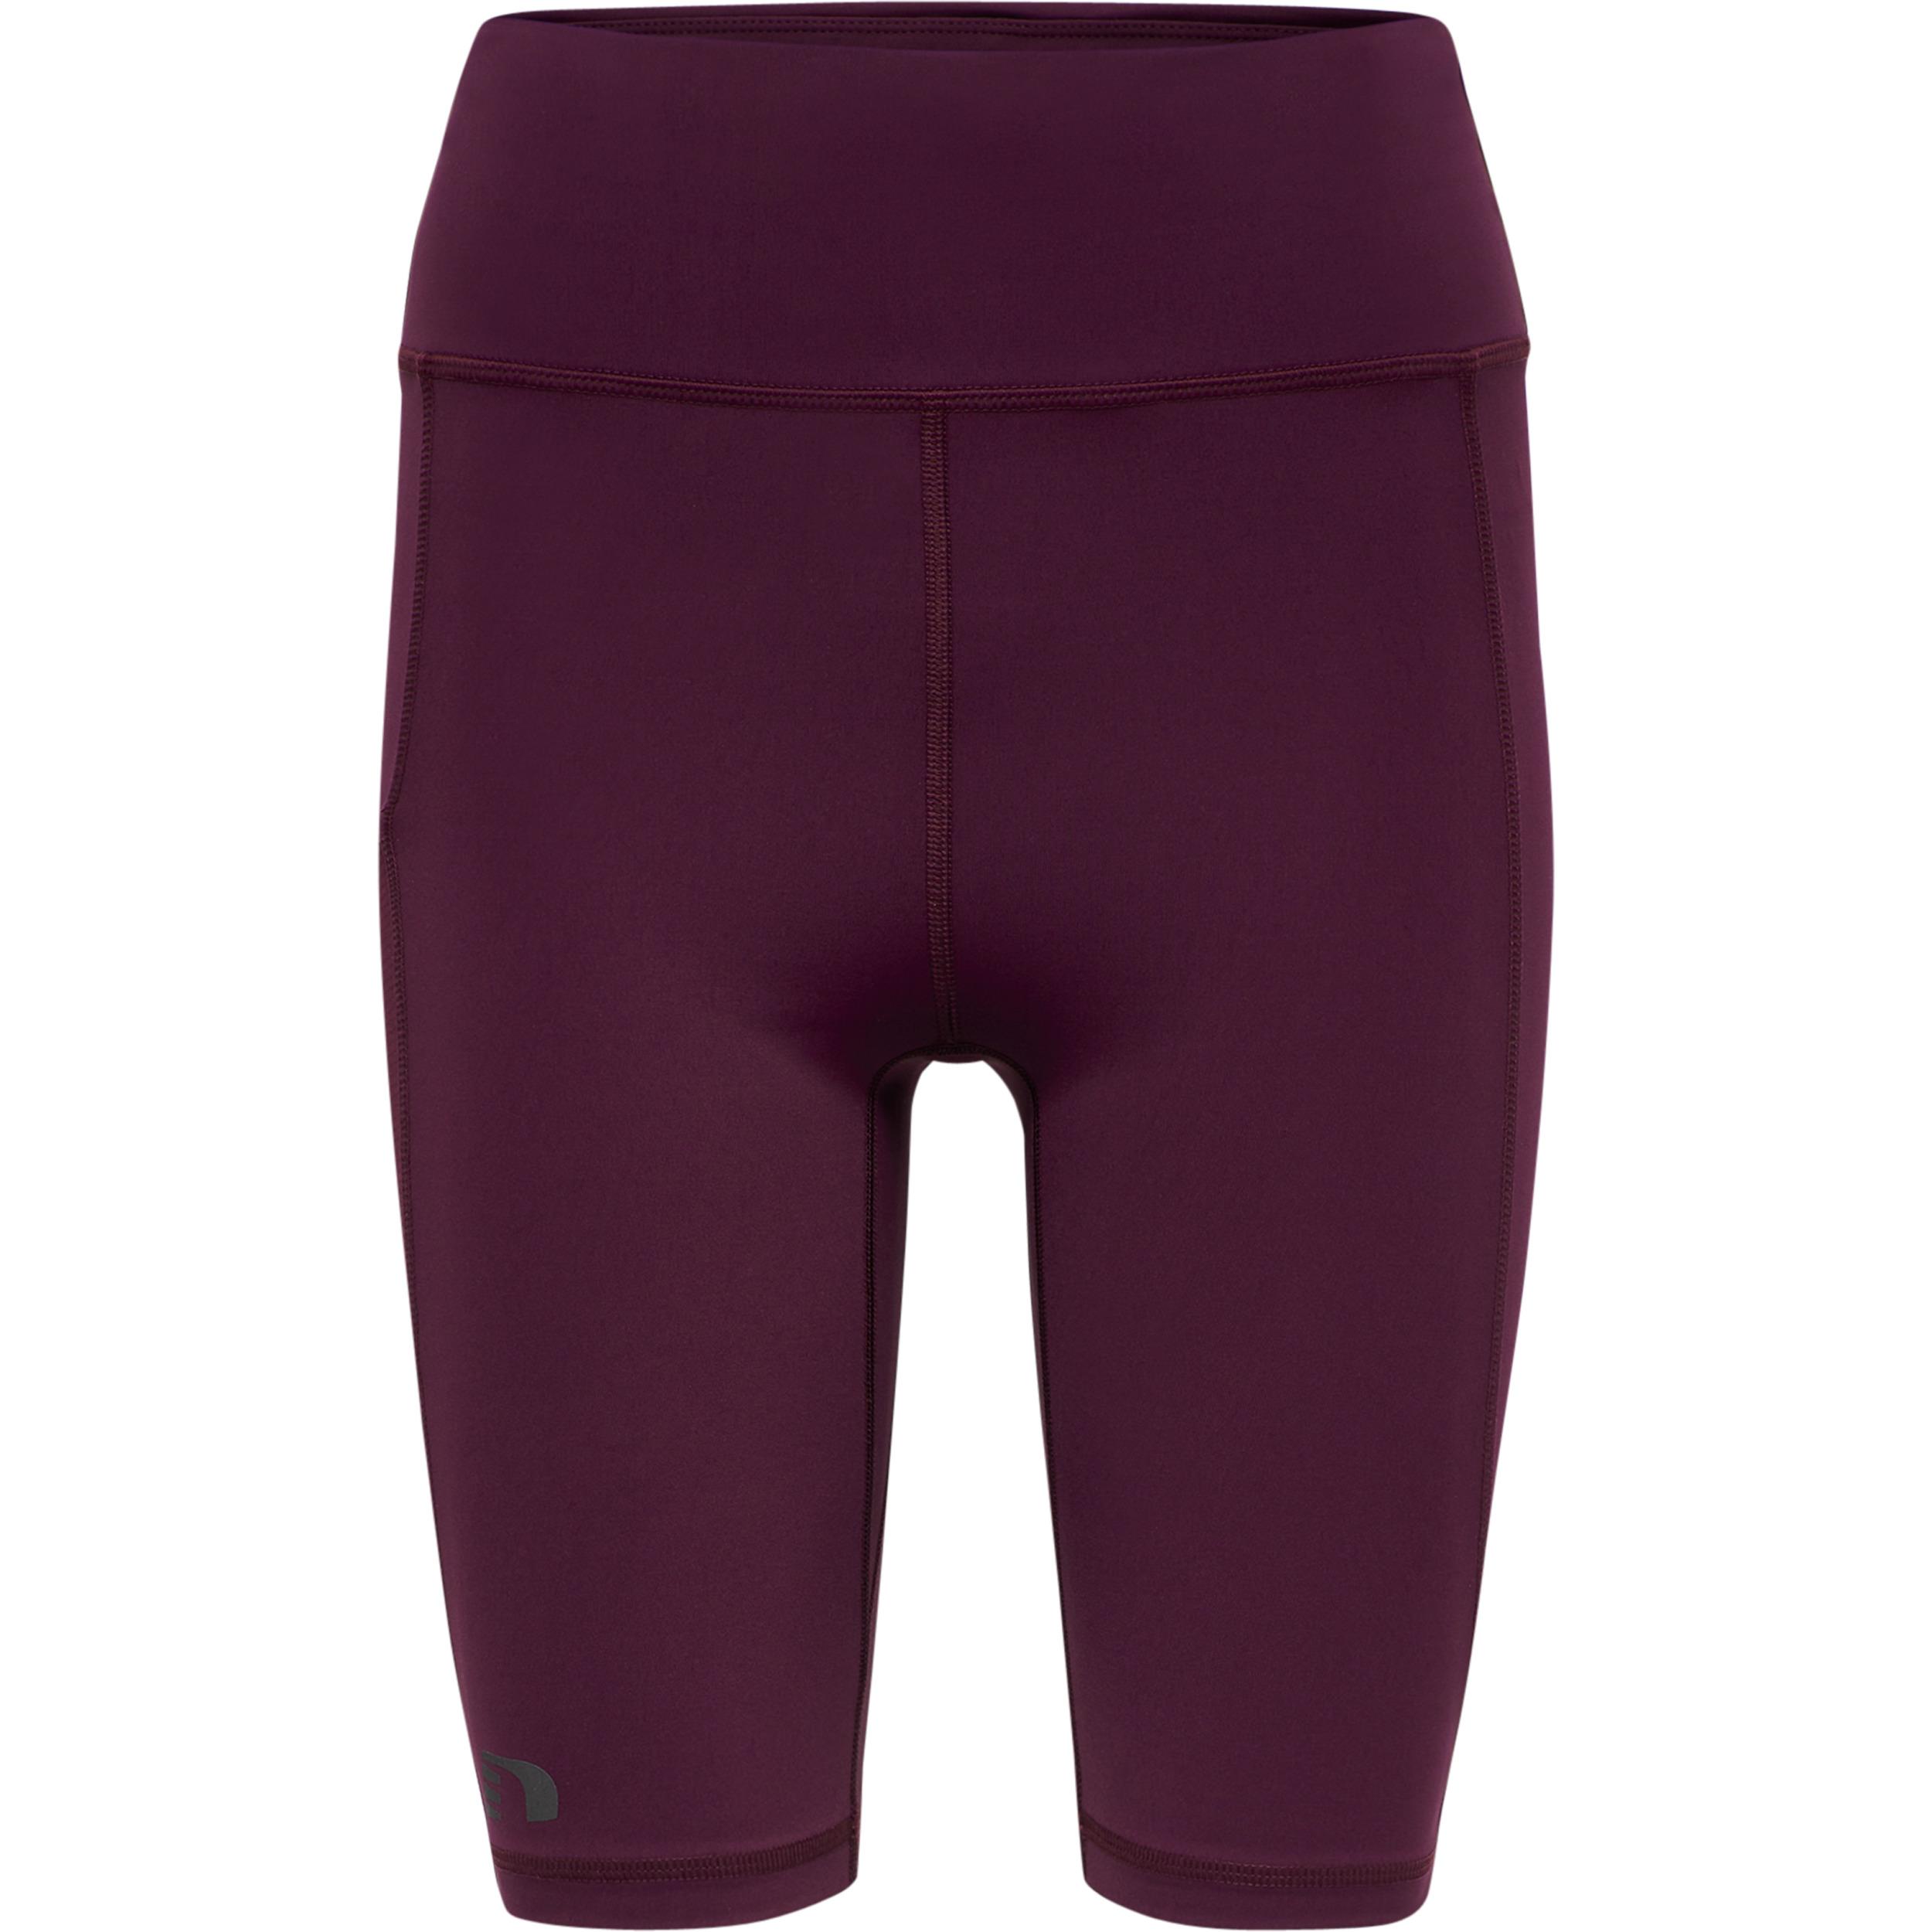 Newline W Højtaljede Sprinter shorts